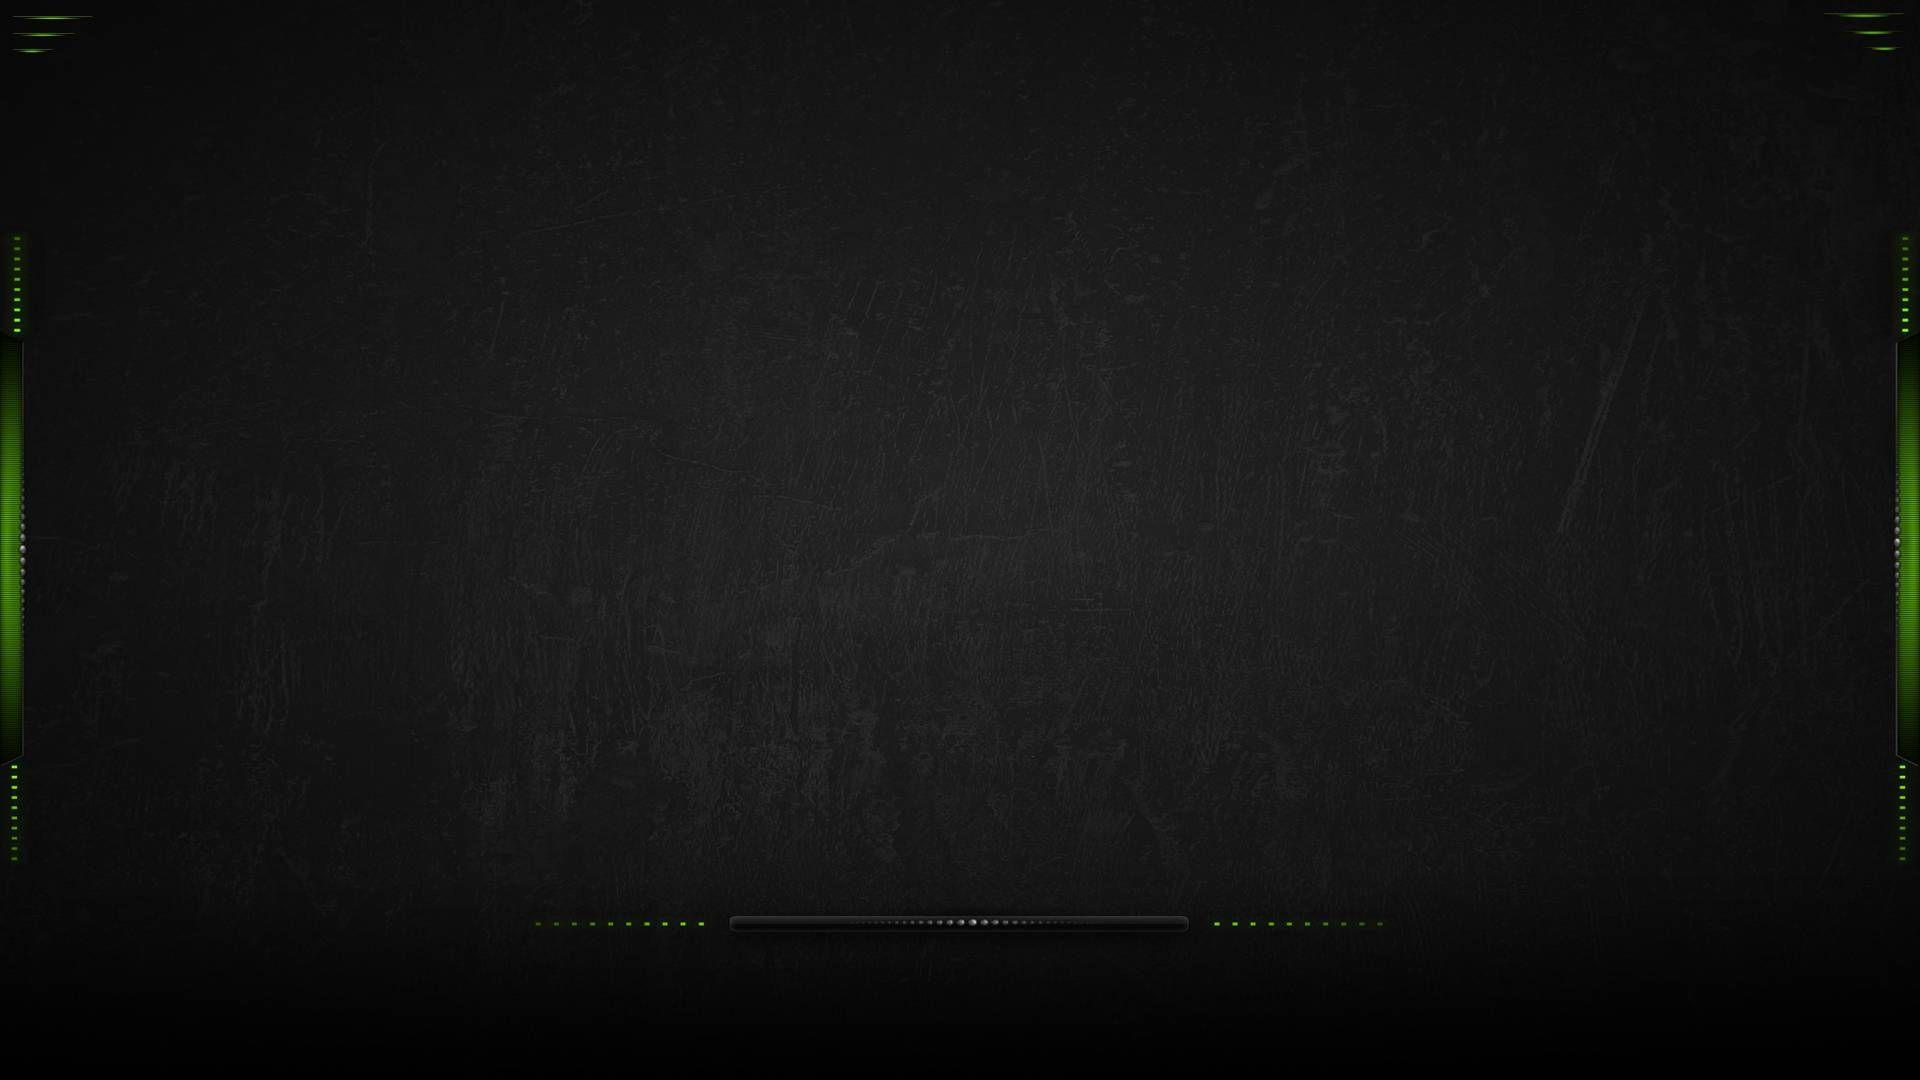 Plain Black Desktop Wallpapers on ...